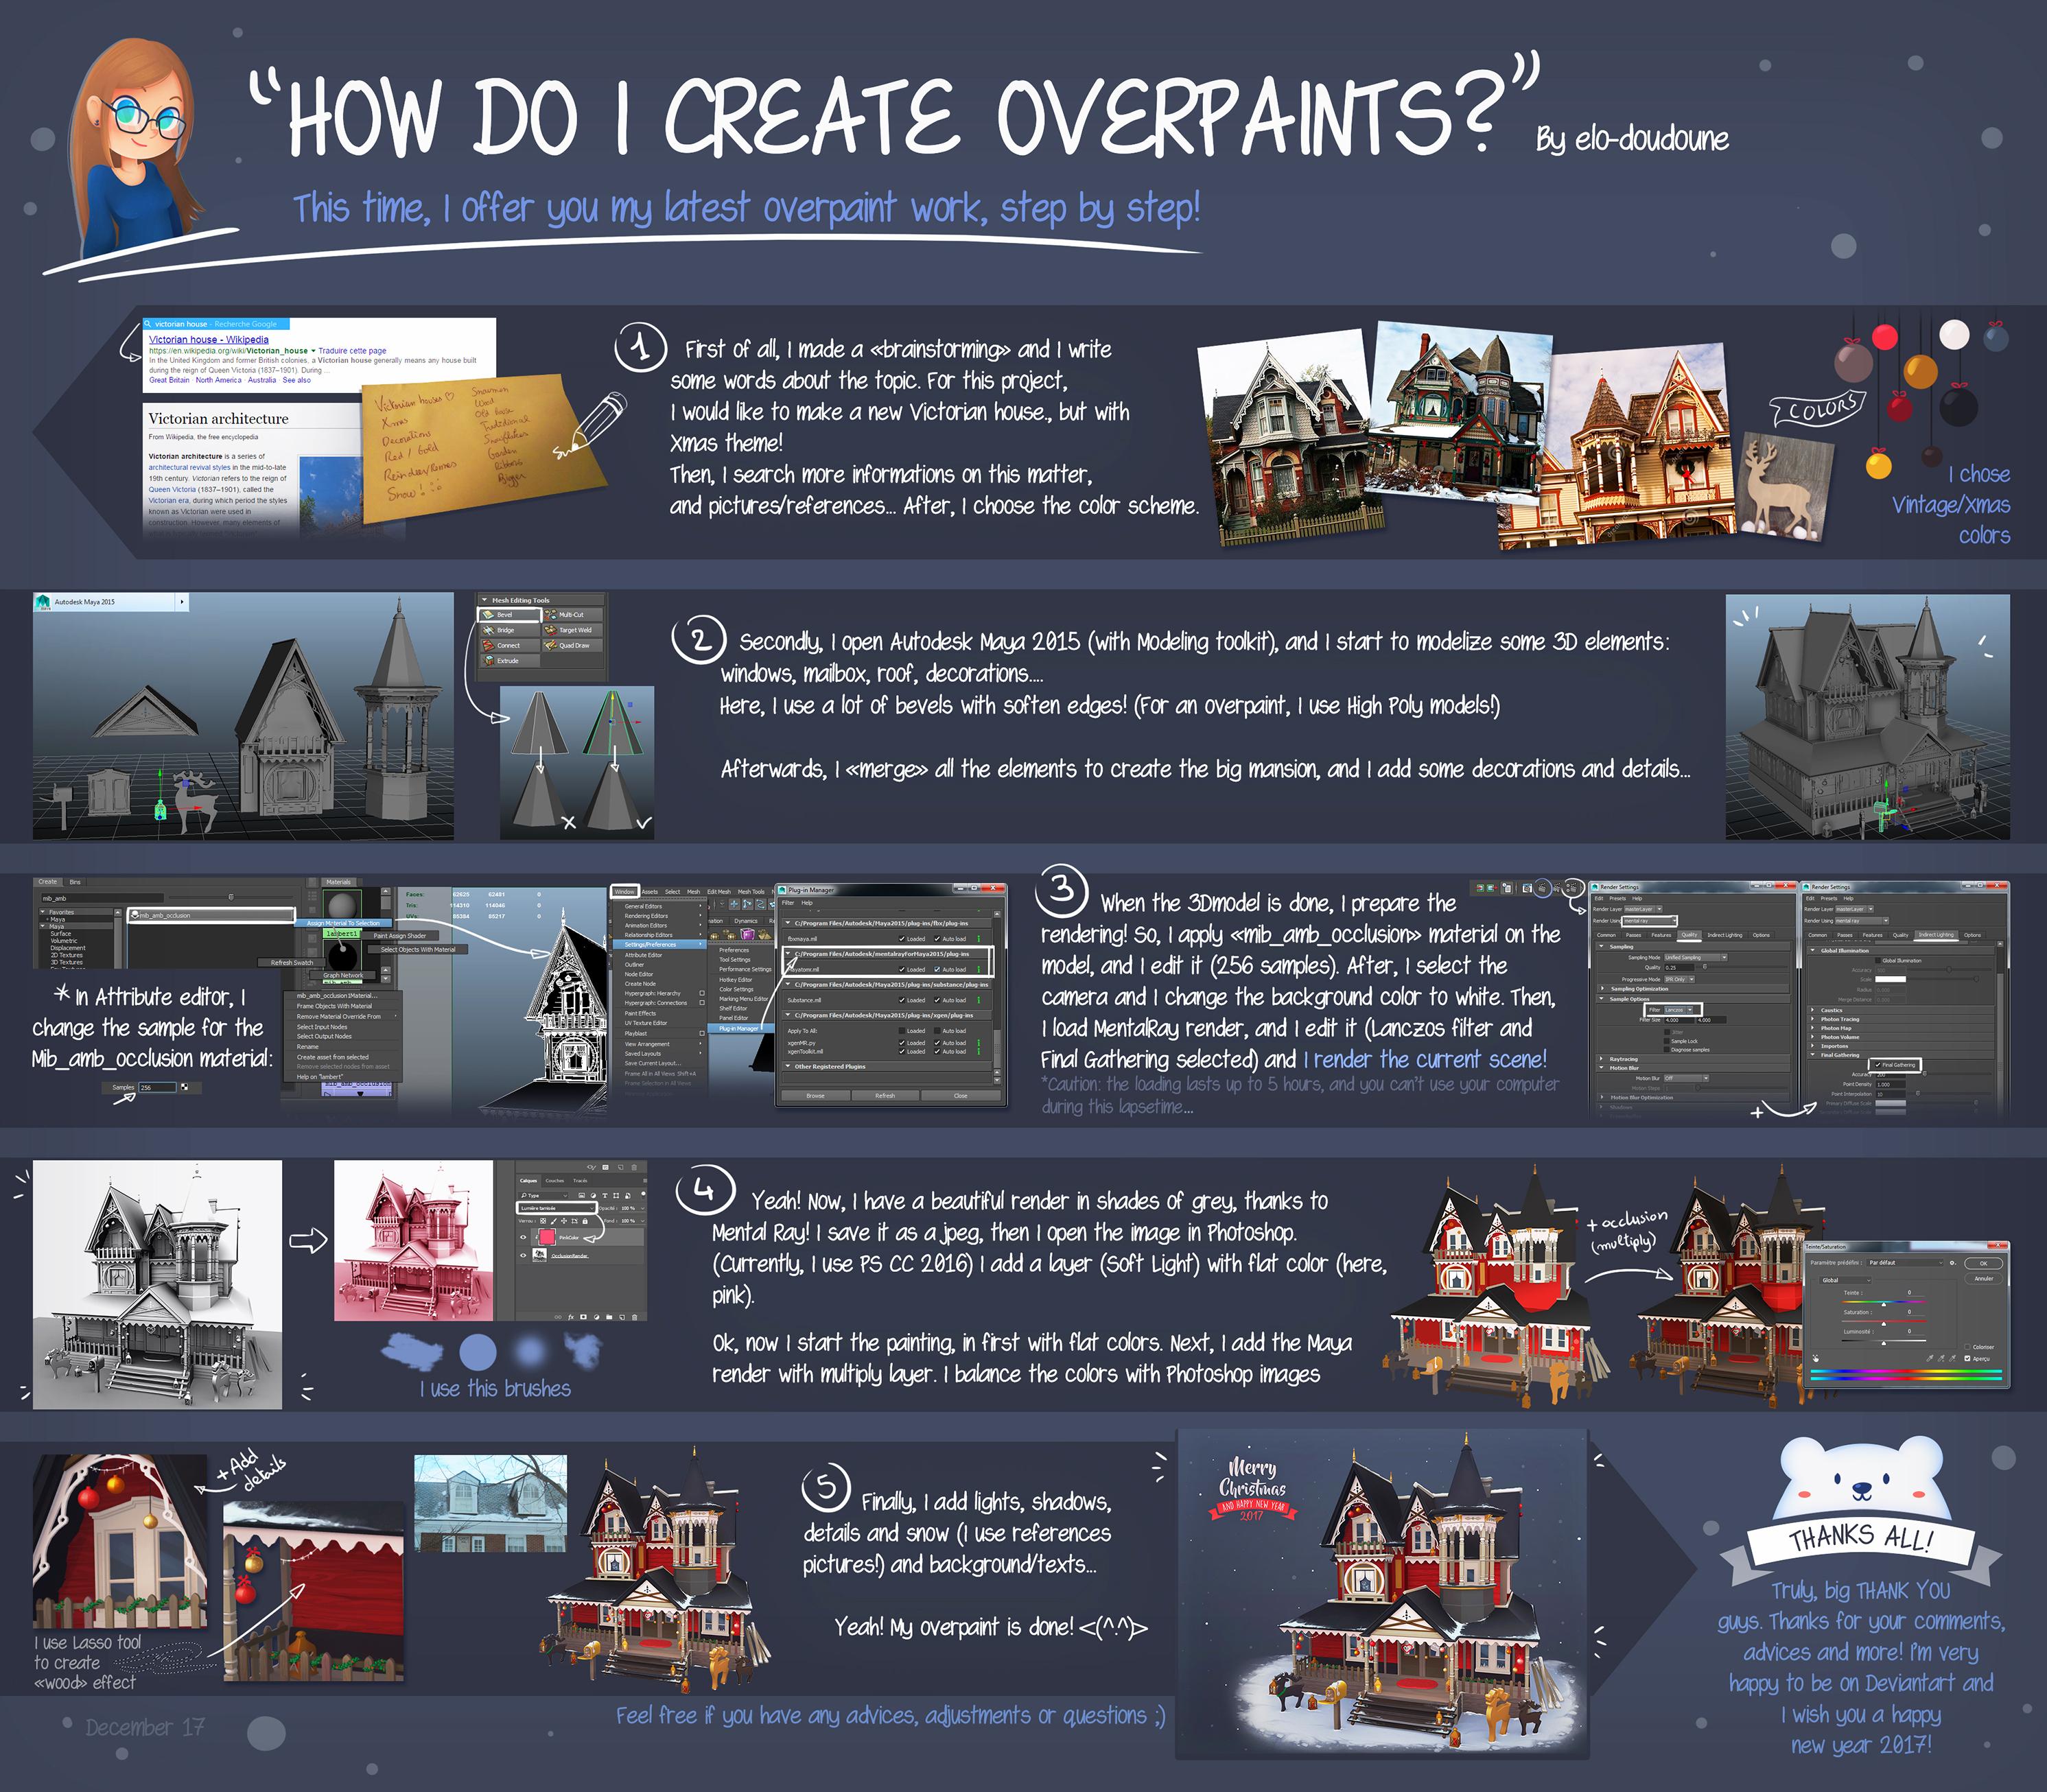 How do I create overpaints? by Elo-Doudoune